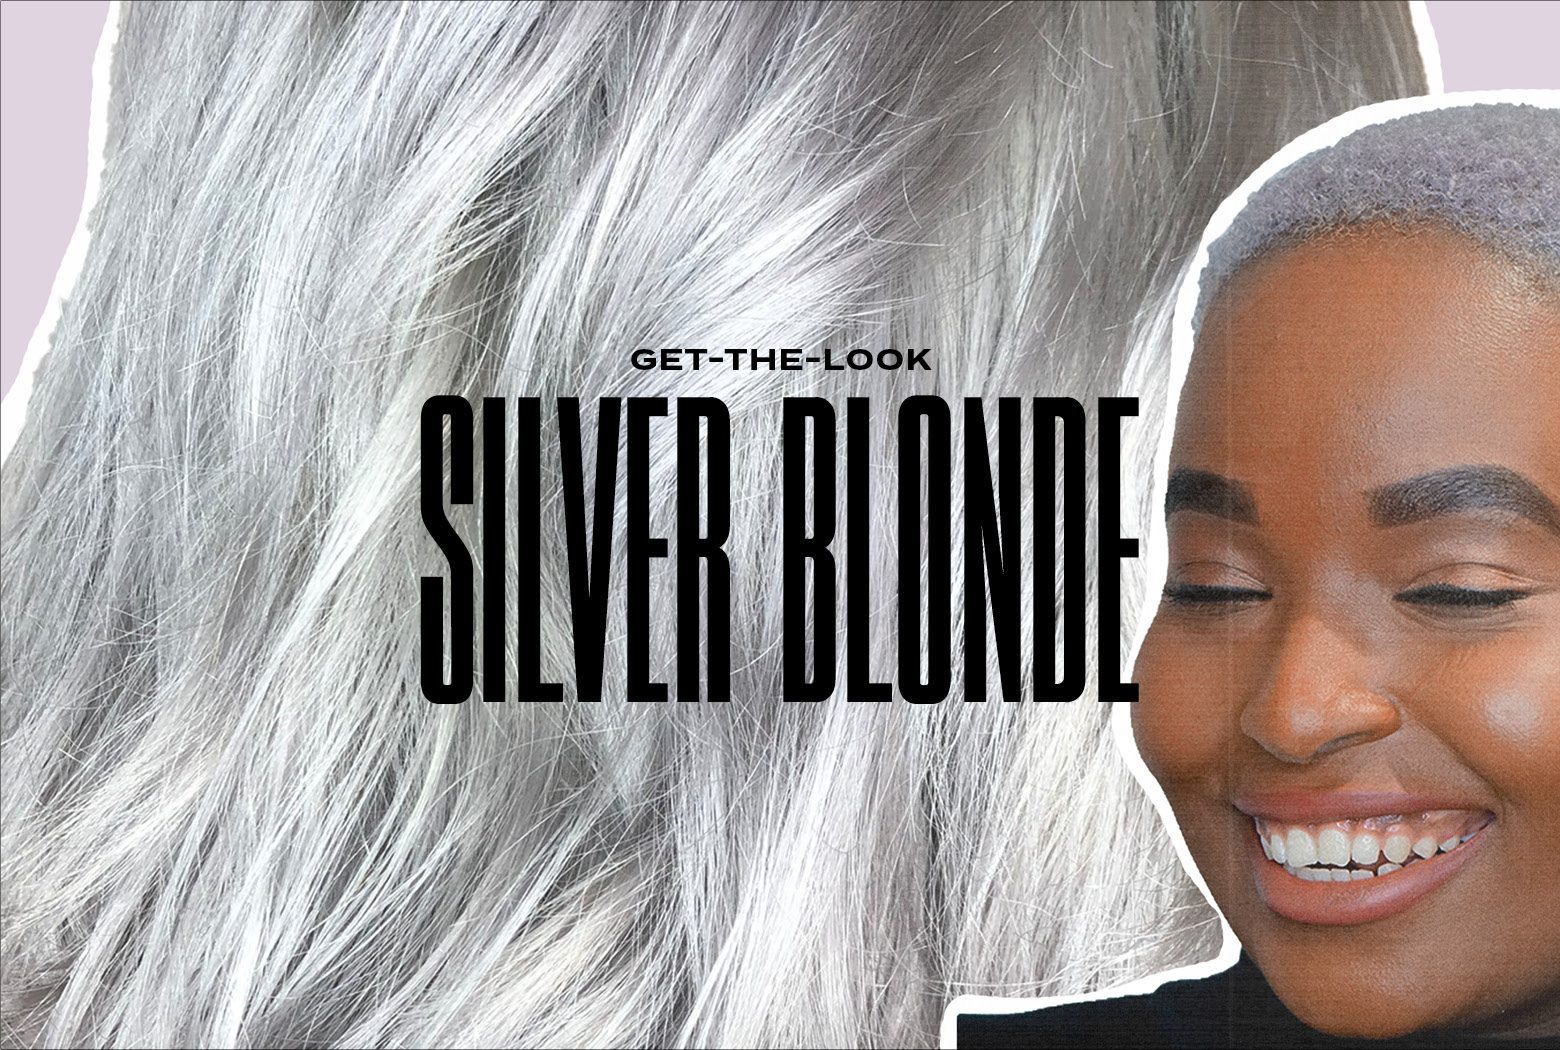 Silver Blonde image